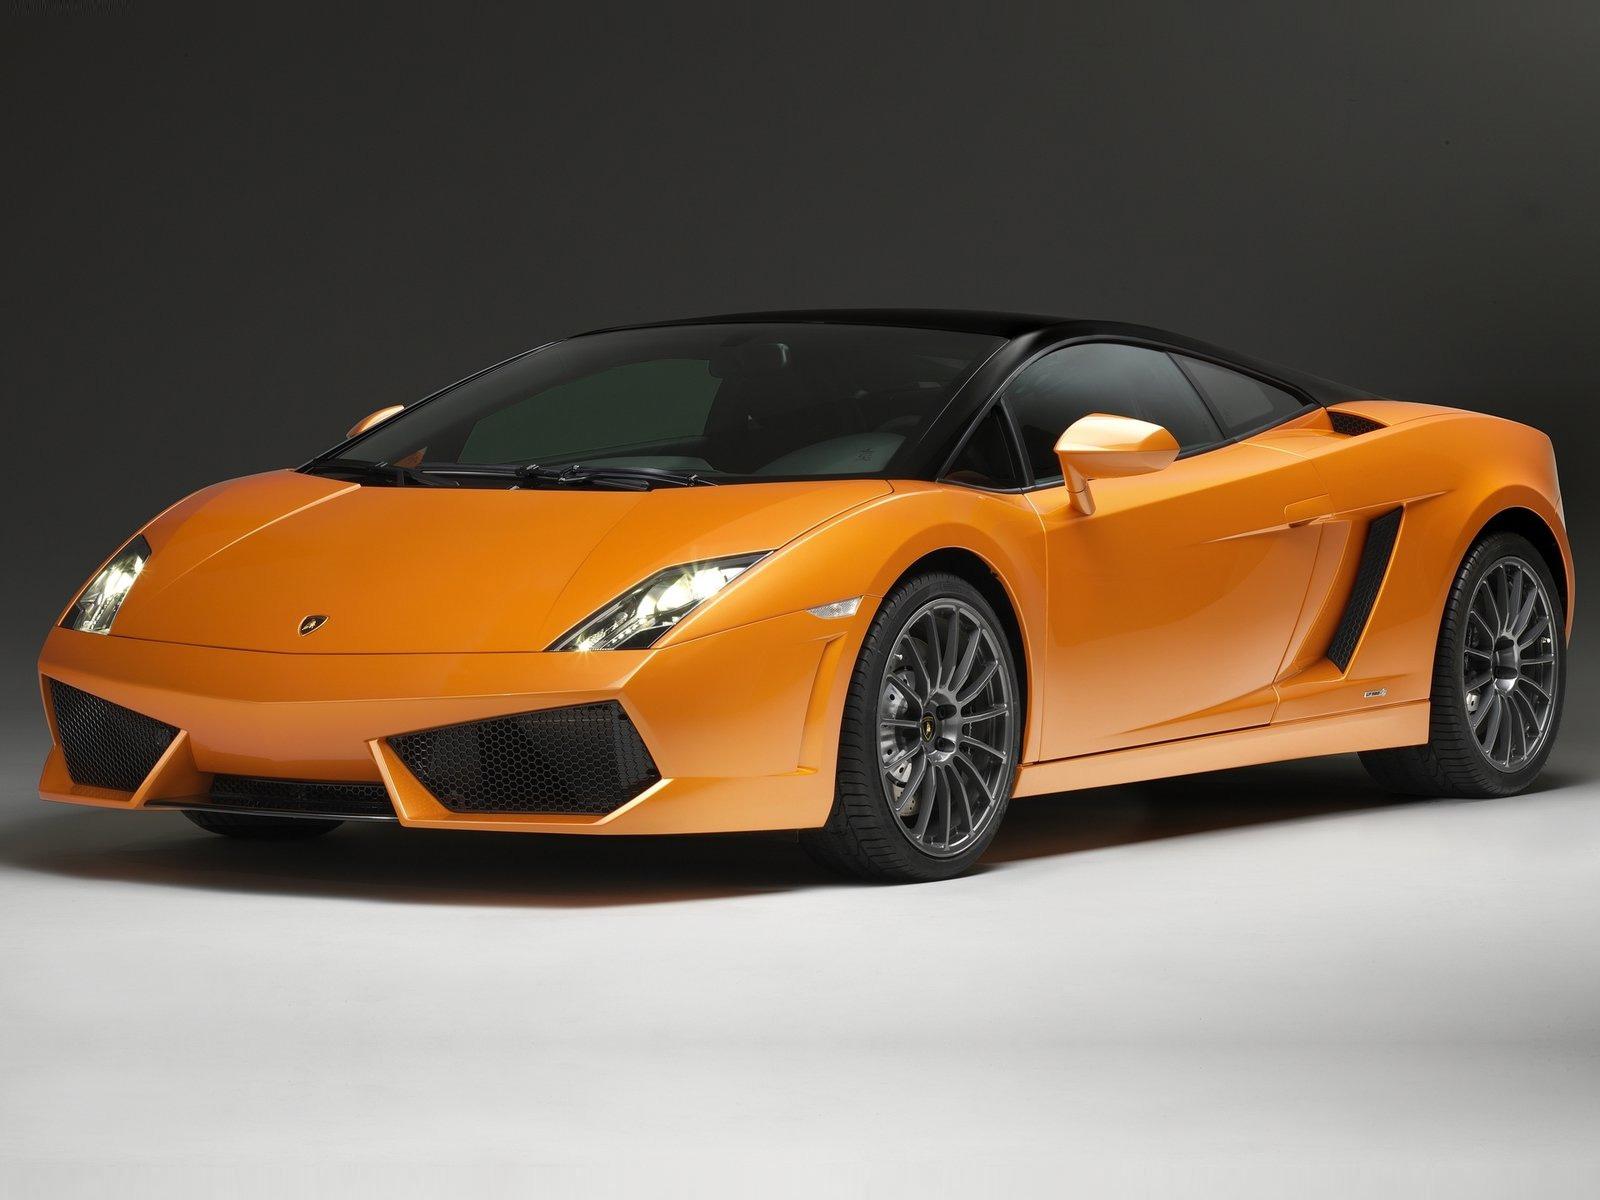 2011 Lamborghini Gallardo Lp5604 Bicolore  Cars Sketches